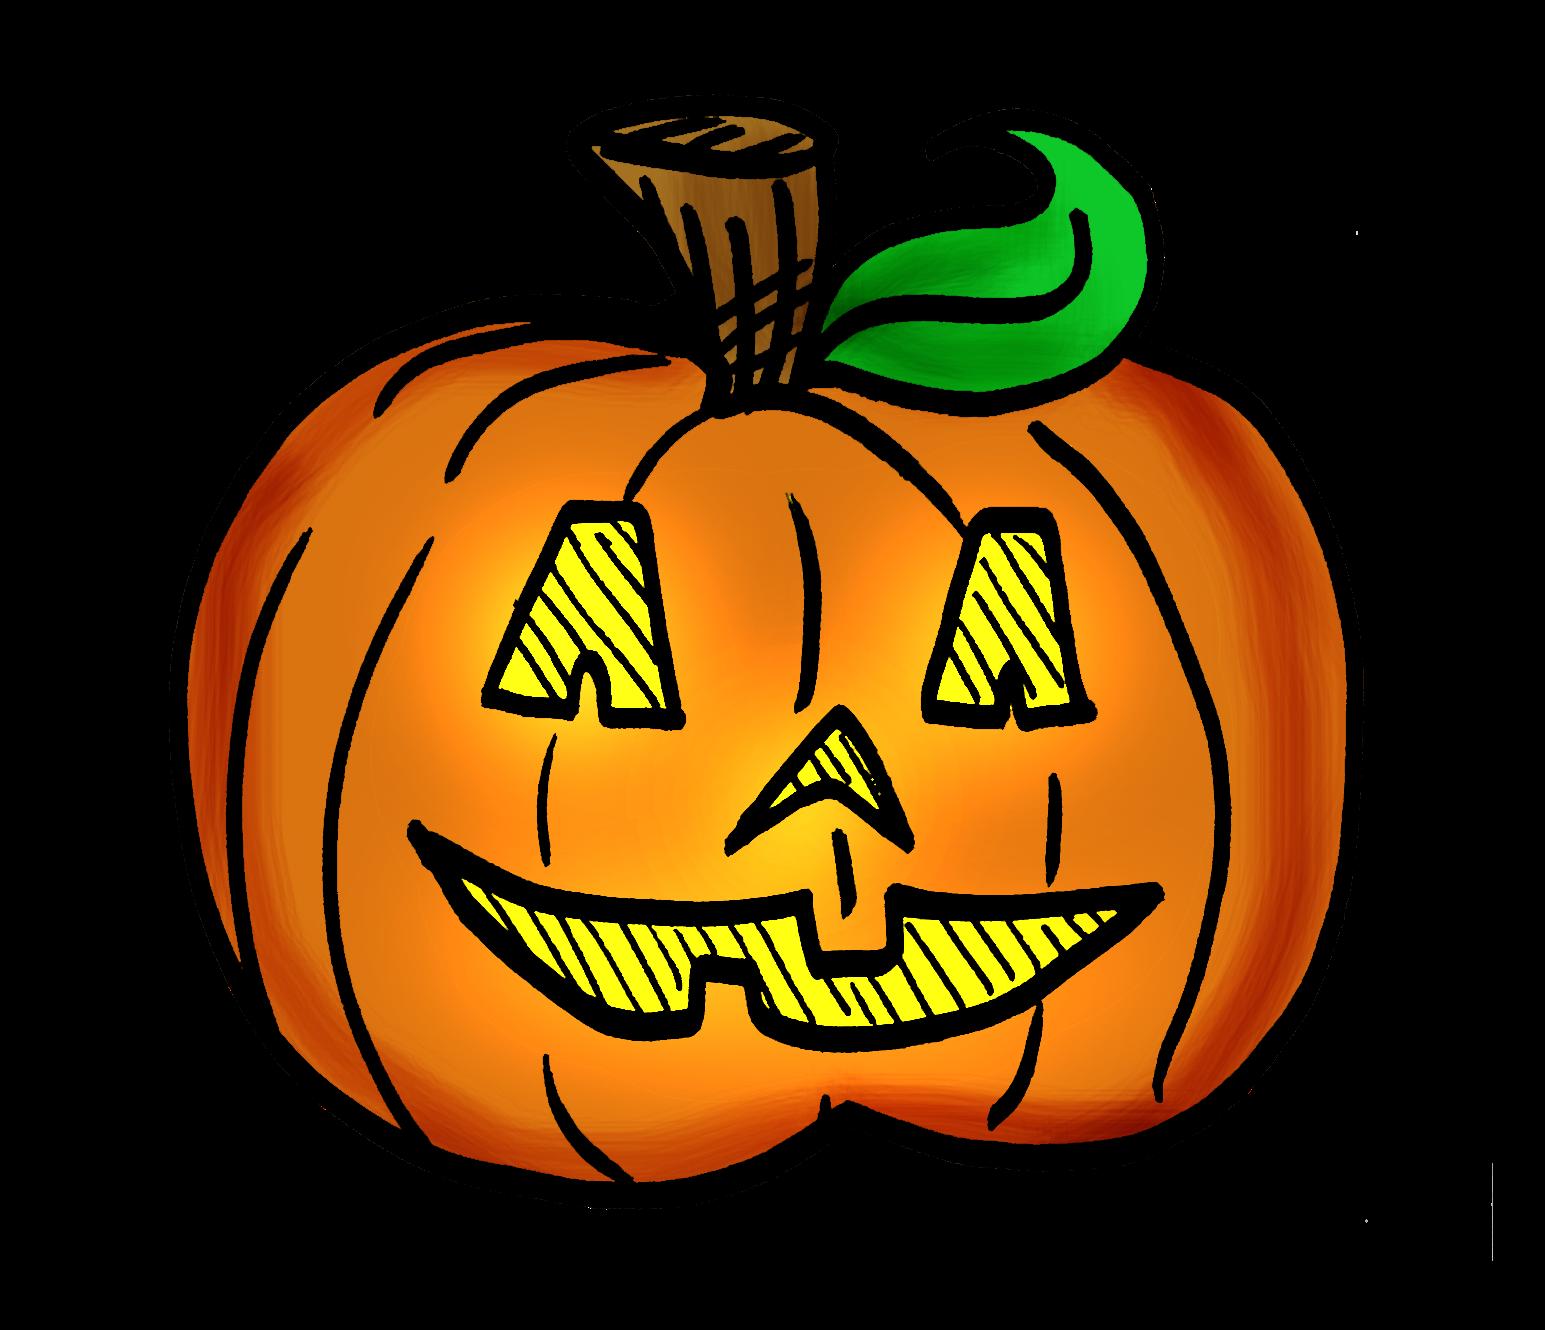 Pumpkin clipart jack o lantern sprite image free download Illumismart image free download